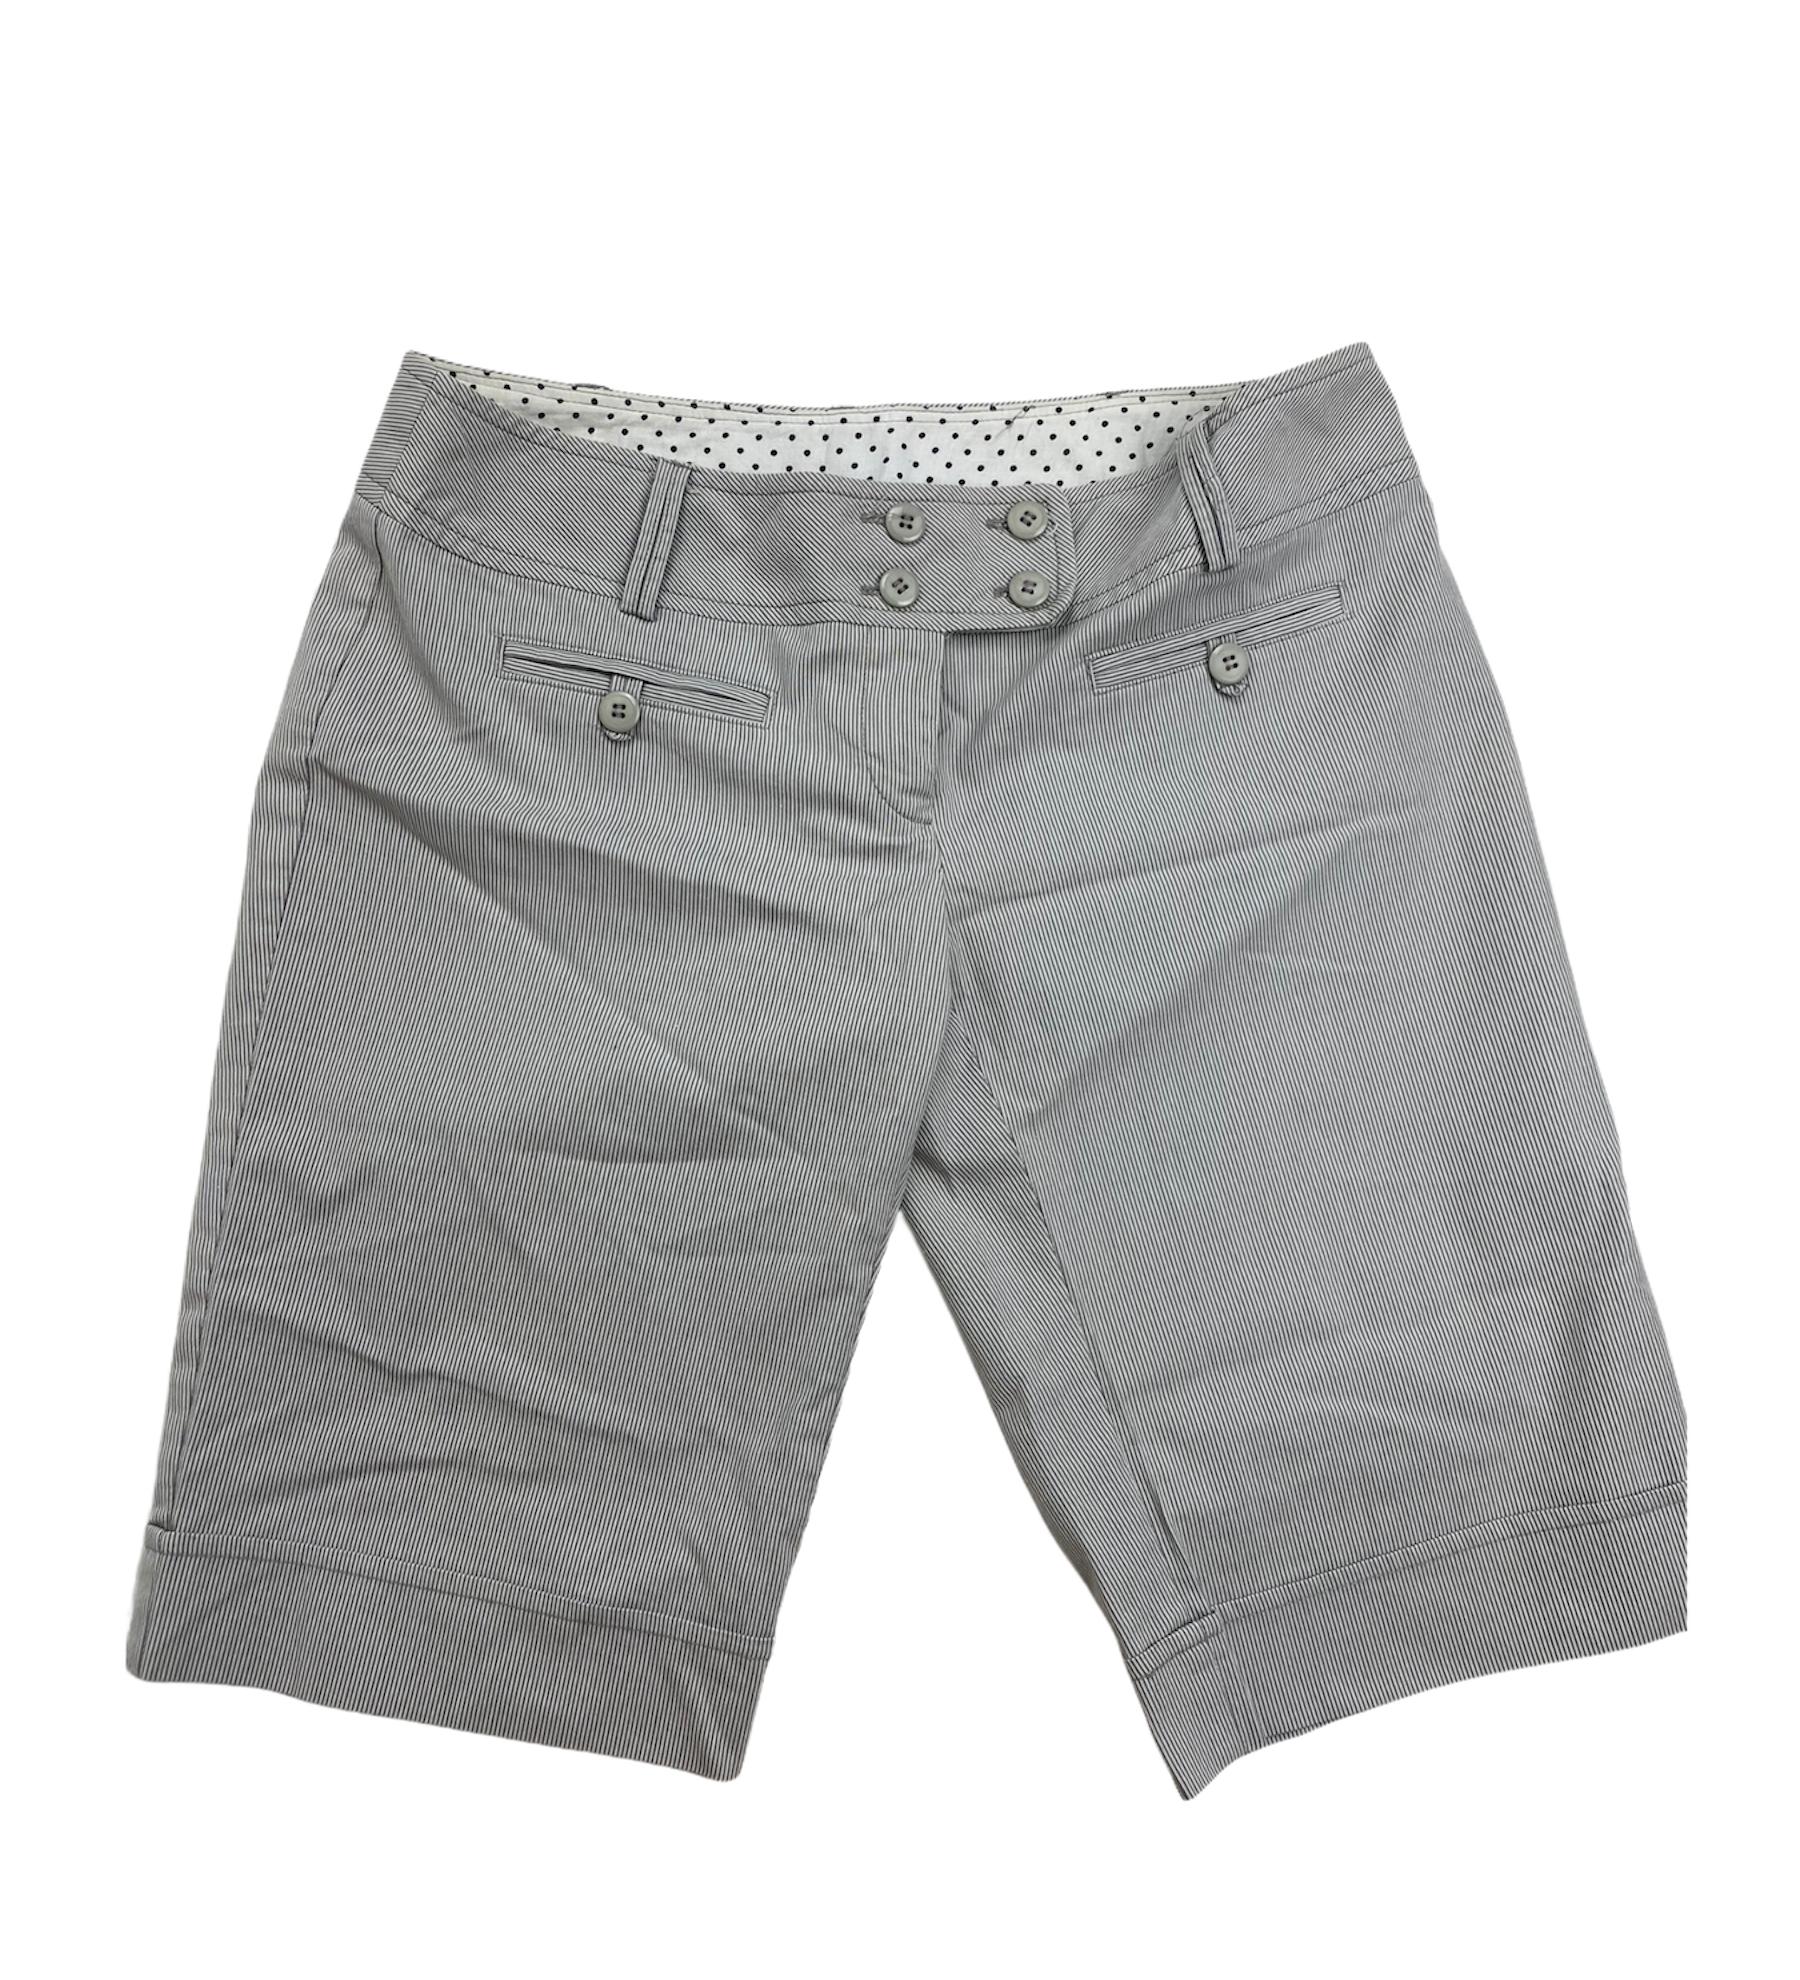 Pantalon Mujer A La Rodilla Color Gris Con Ranuras Blancas Wet Seal Dto Store